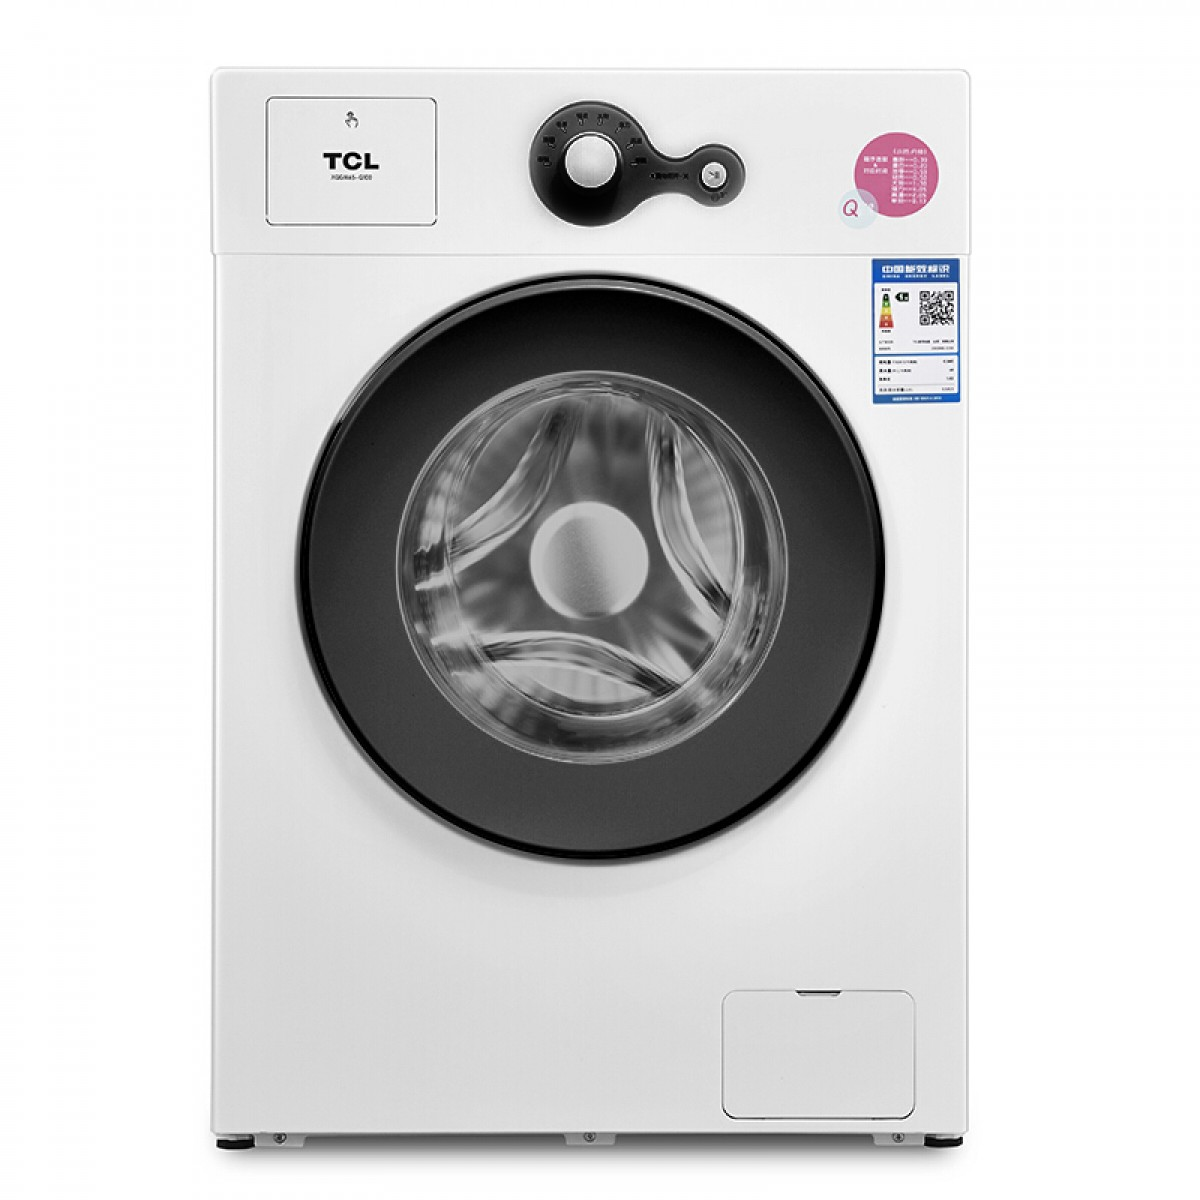 TCL 洗衣机 TG-V70芭蕾白